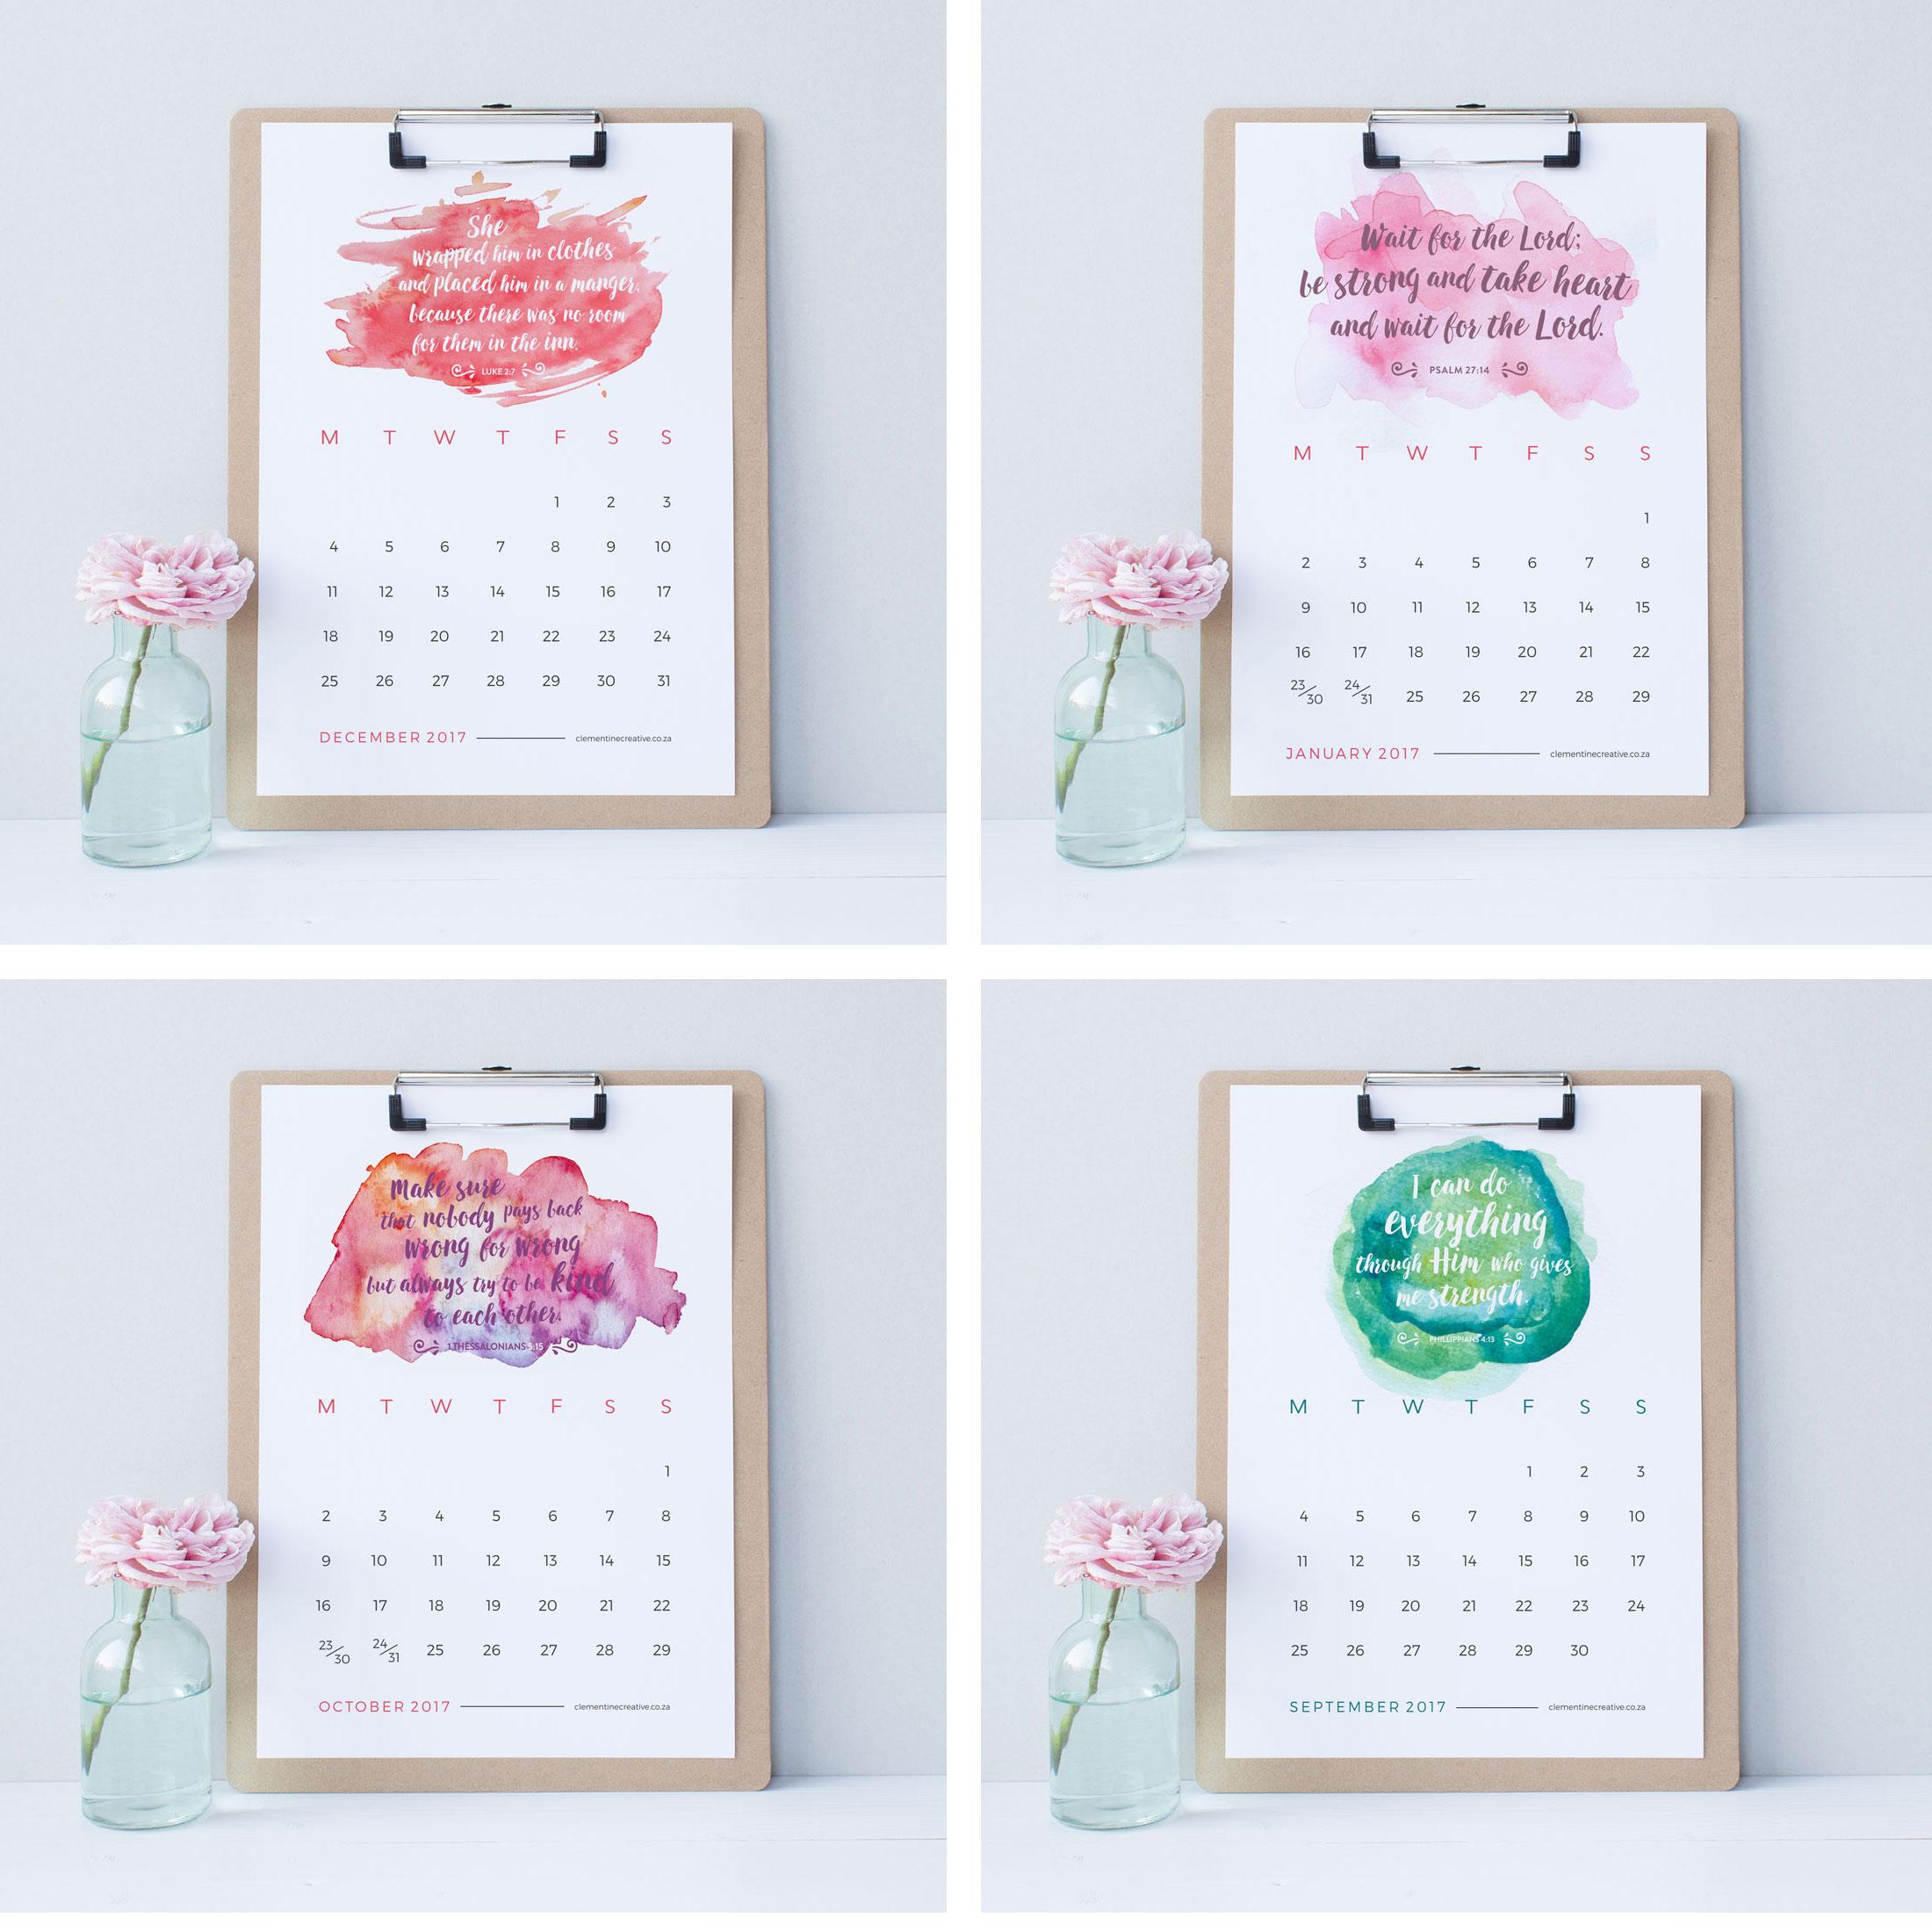 ... Printable Calendars / Printable 2017 Wall Calendar – Bible Verses